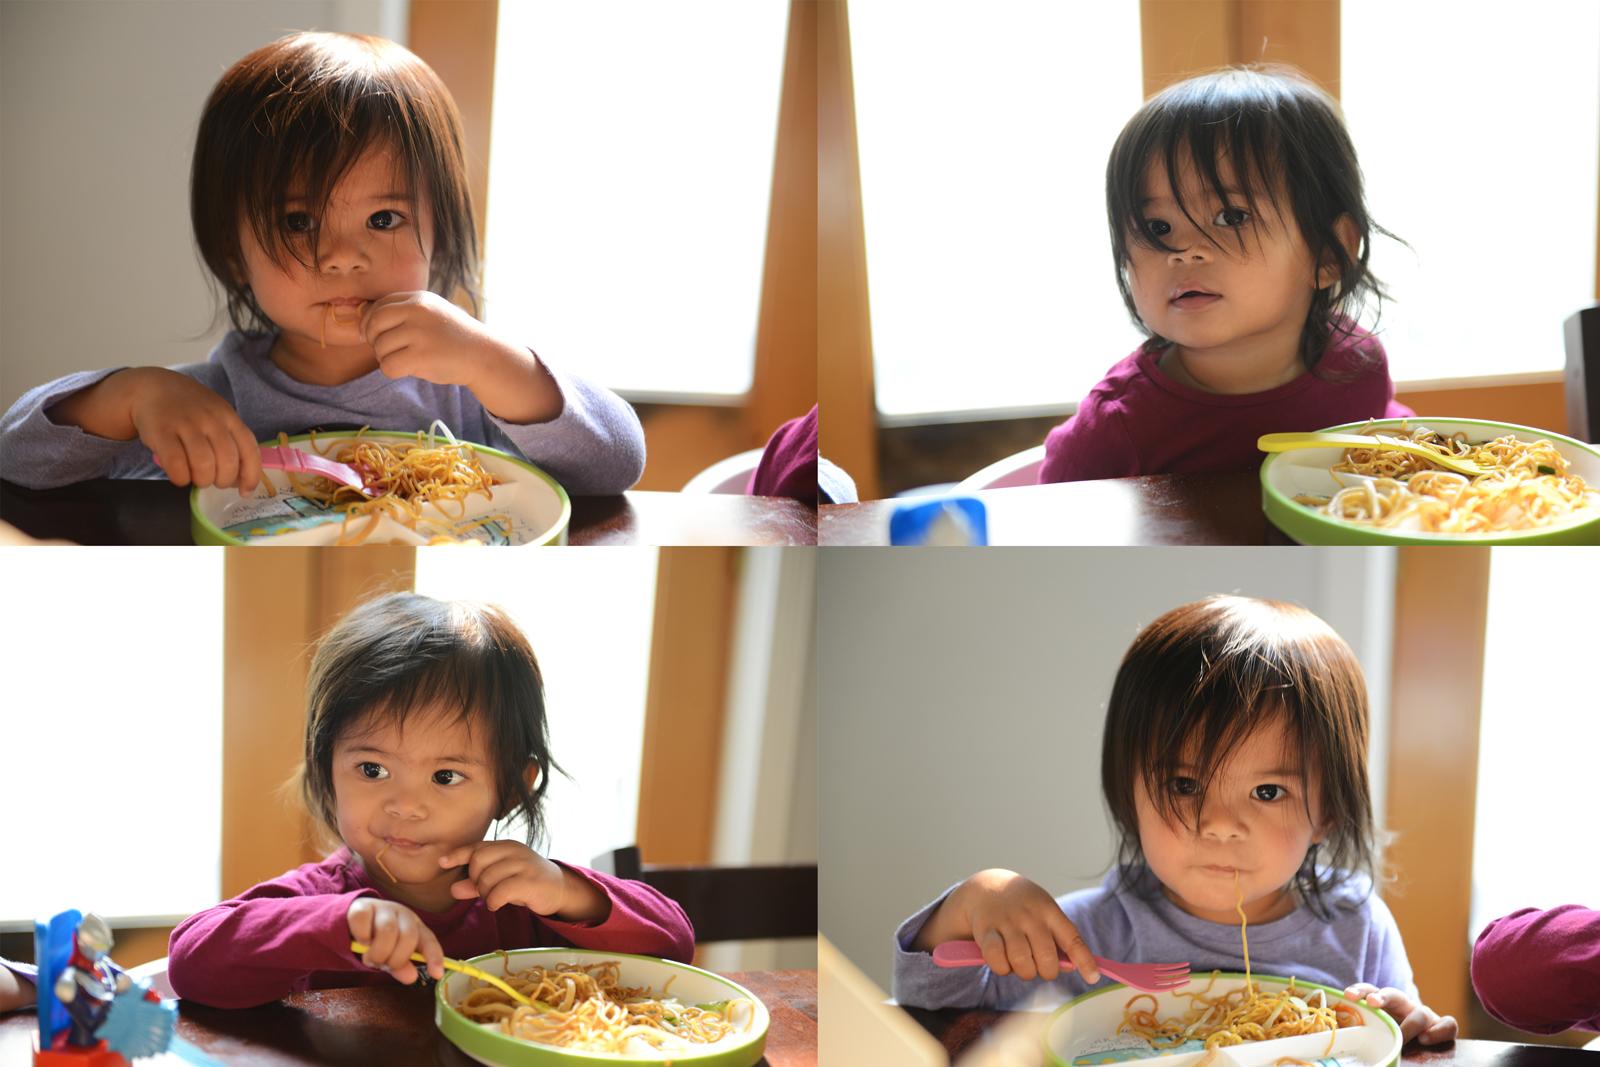 Twins Noodles_RSZ.jpg